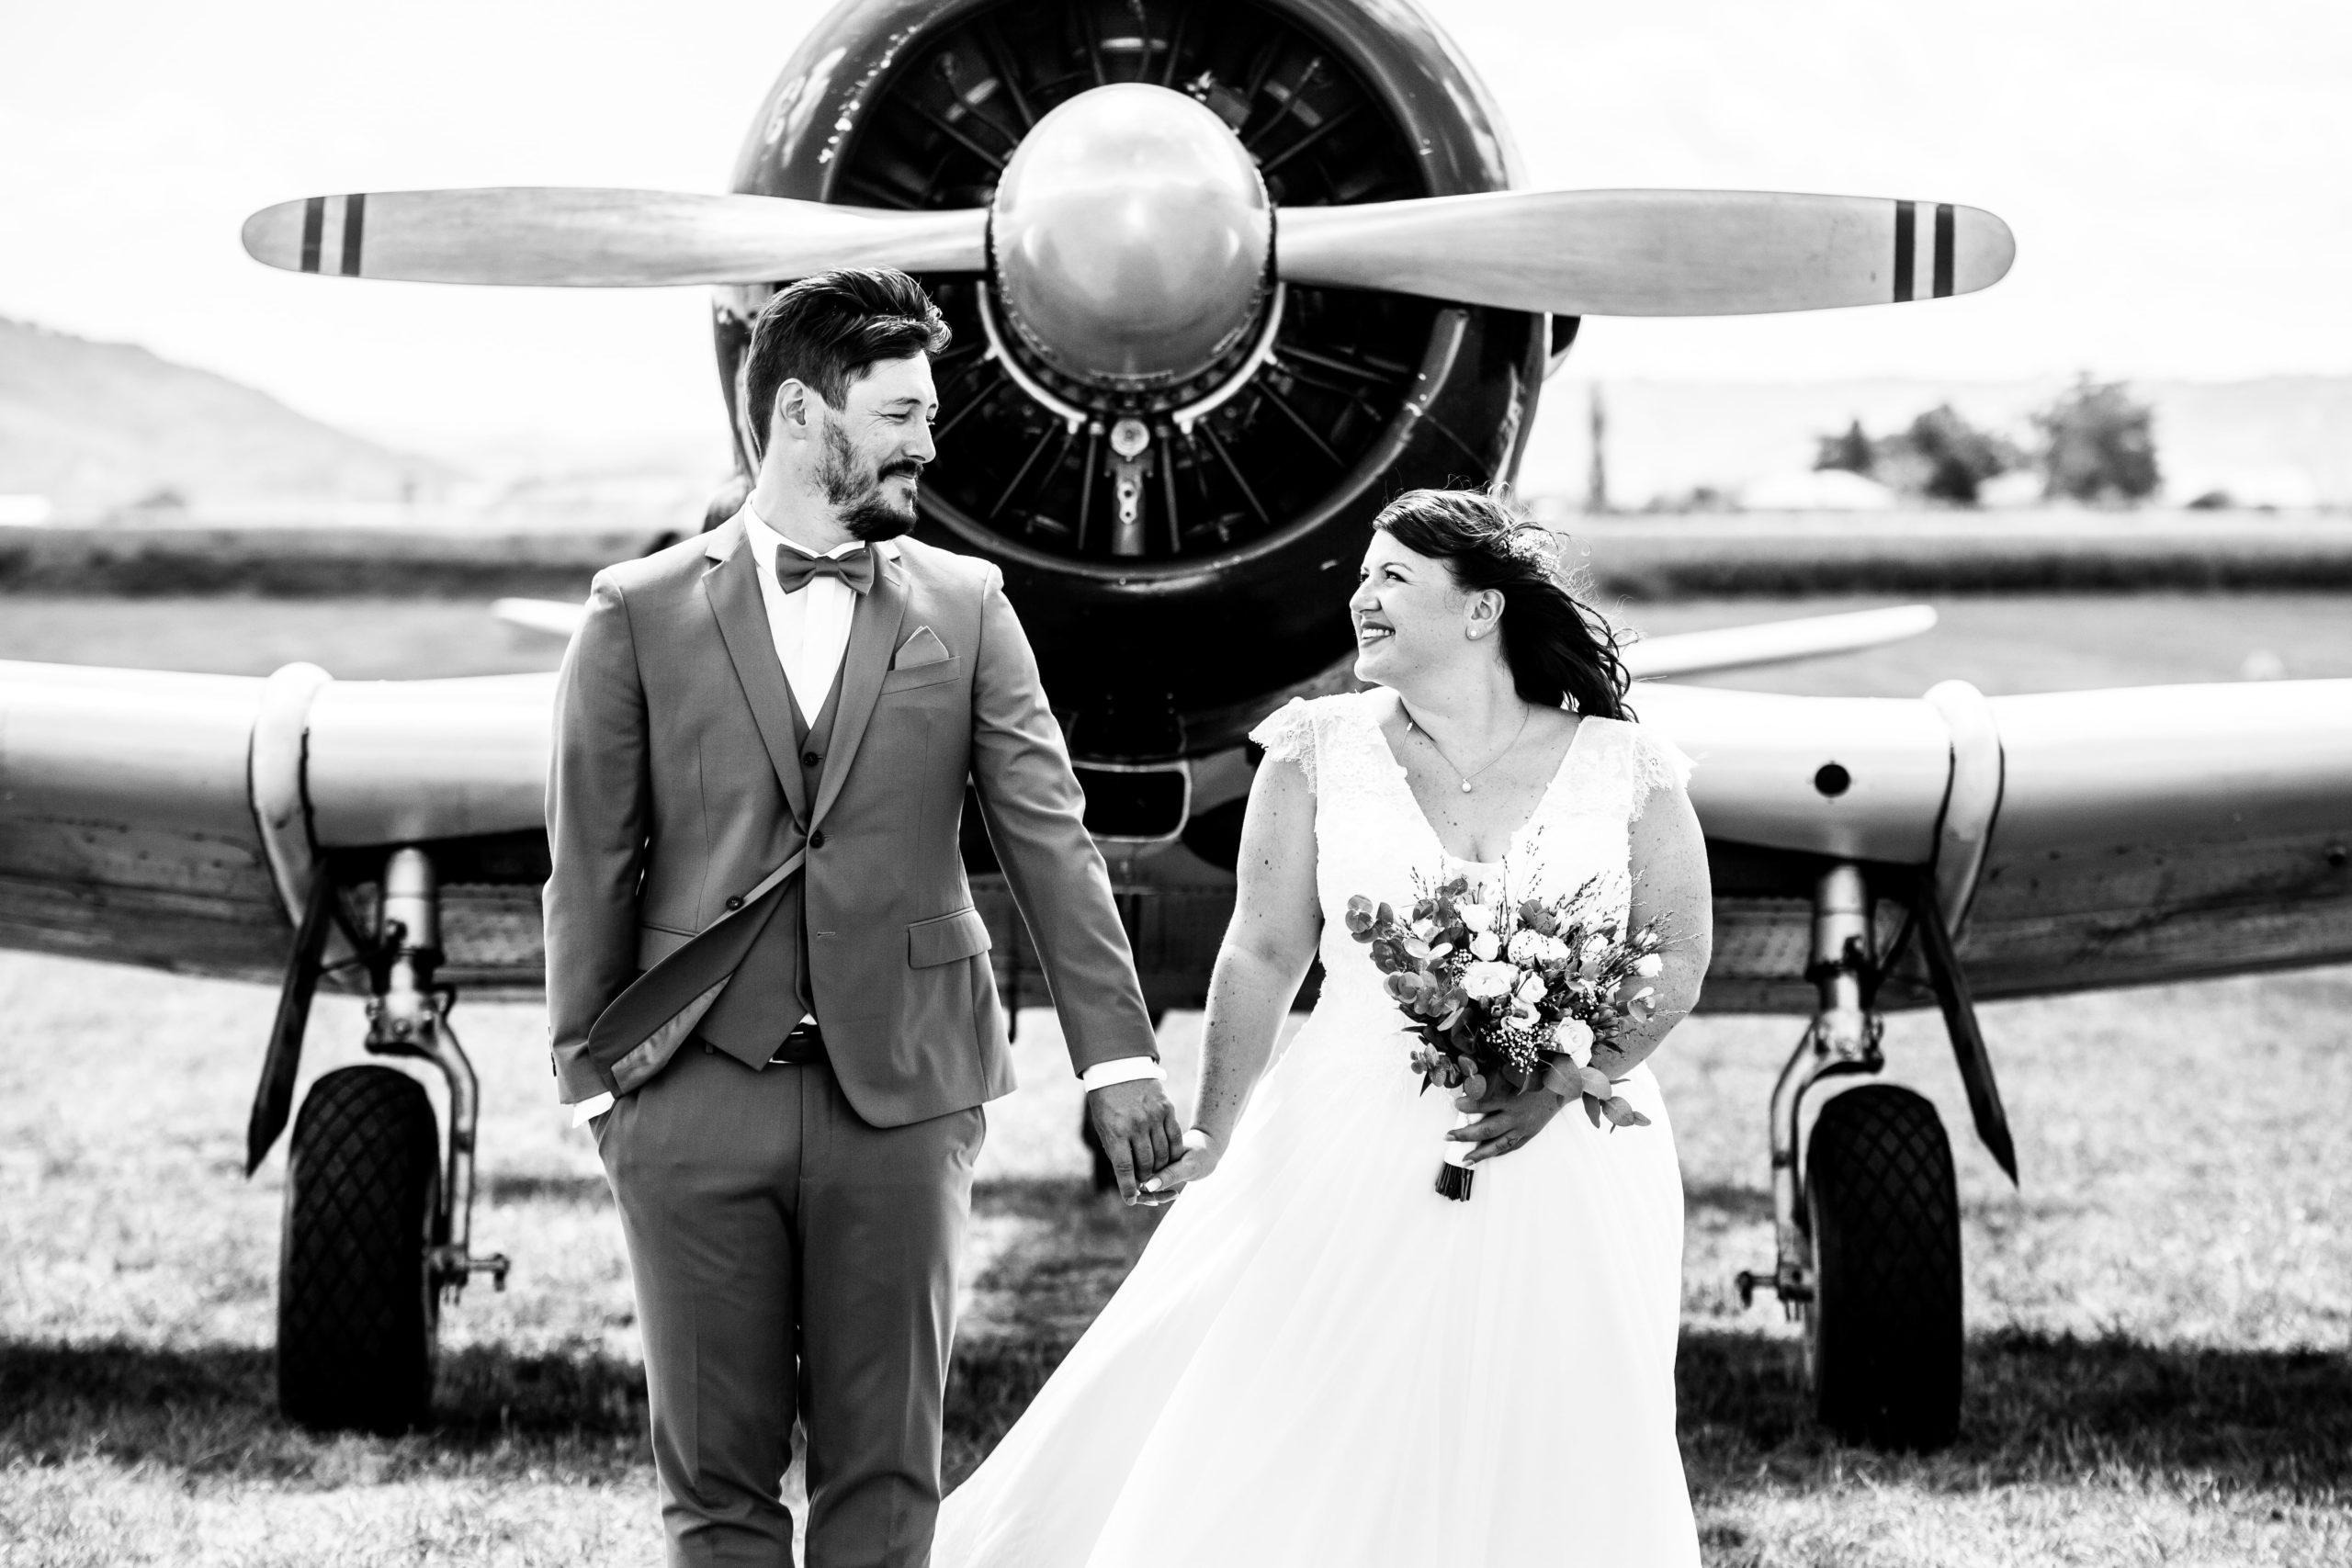 mariage avion couple